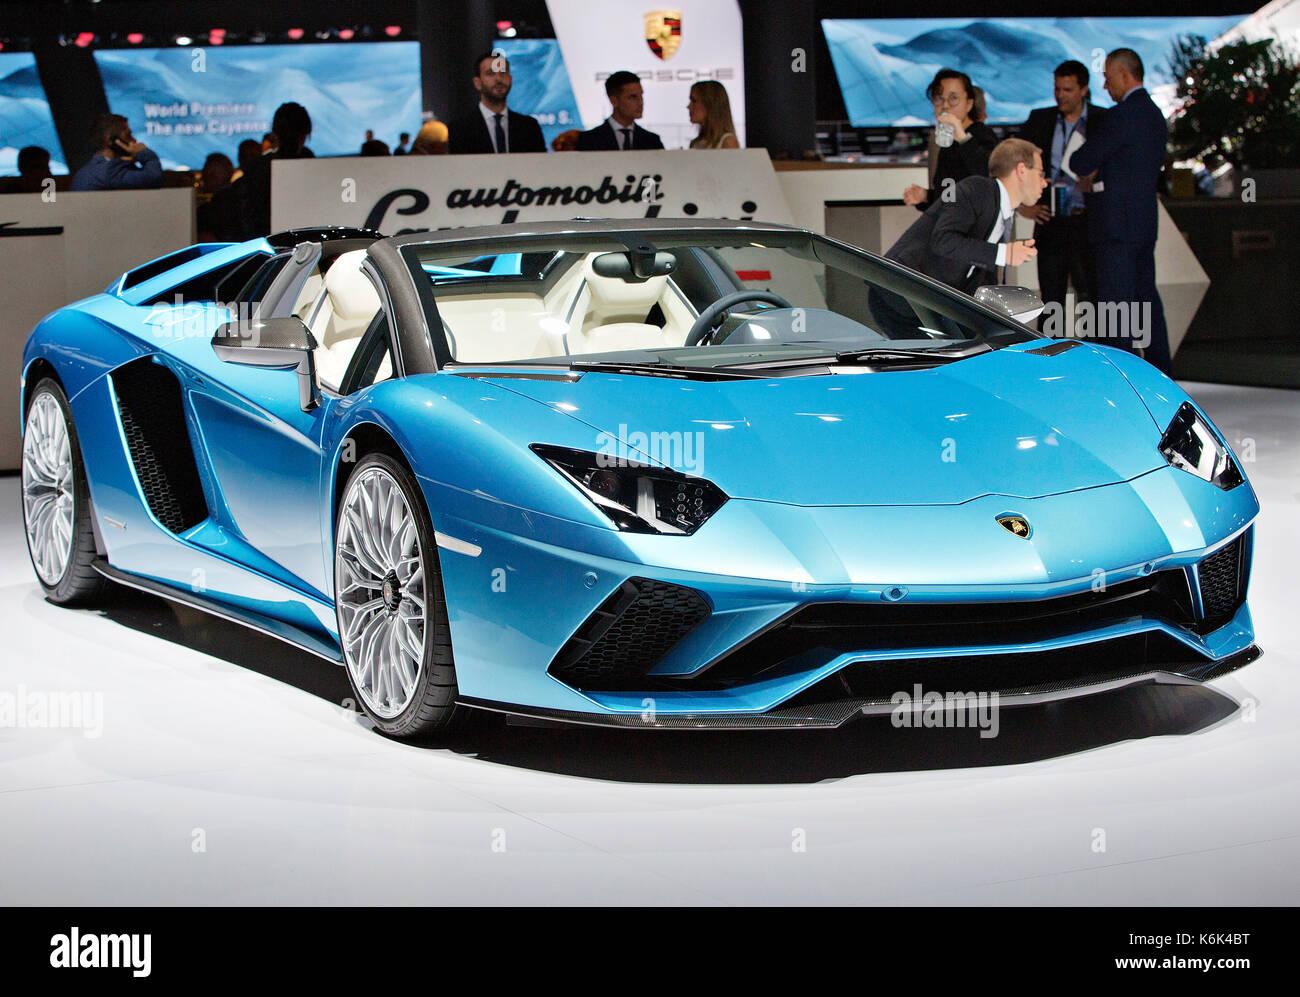 Lamborghini Aventador Roadster Stock Photo Alamy